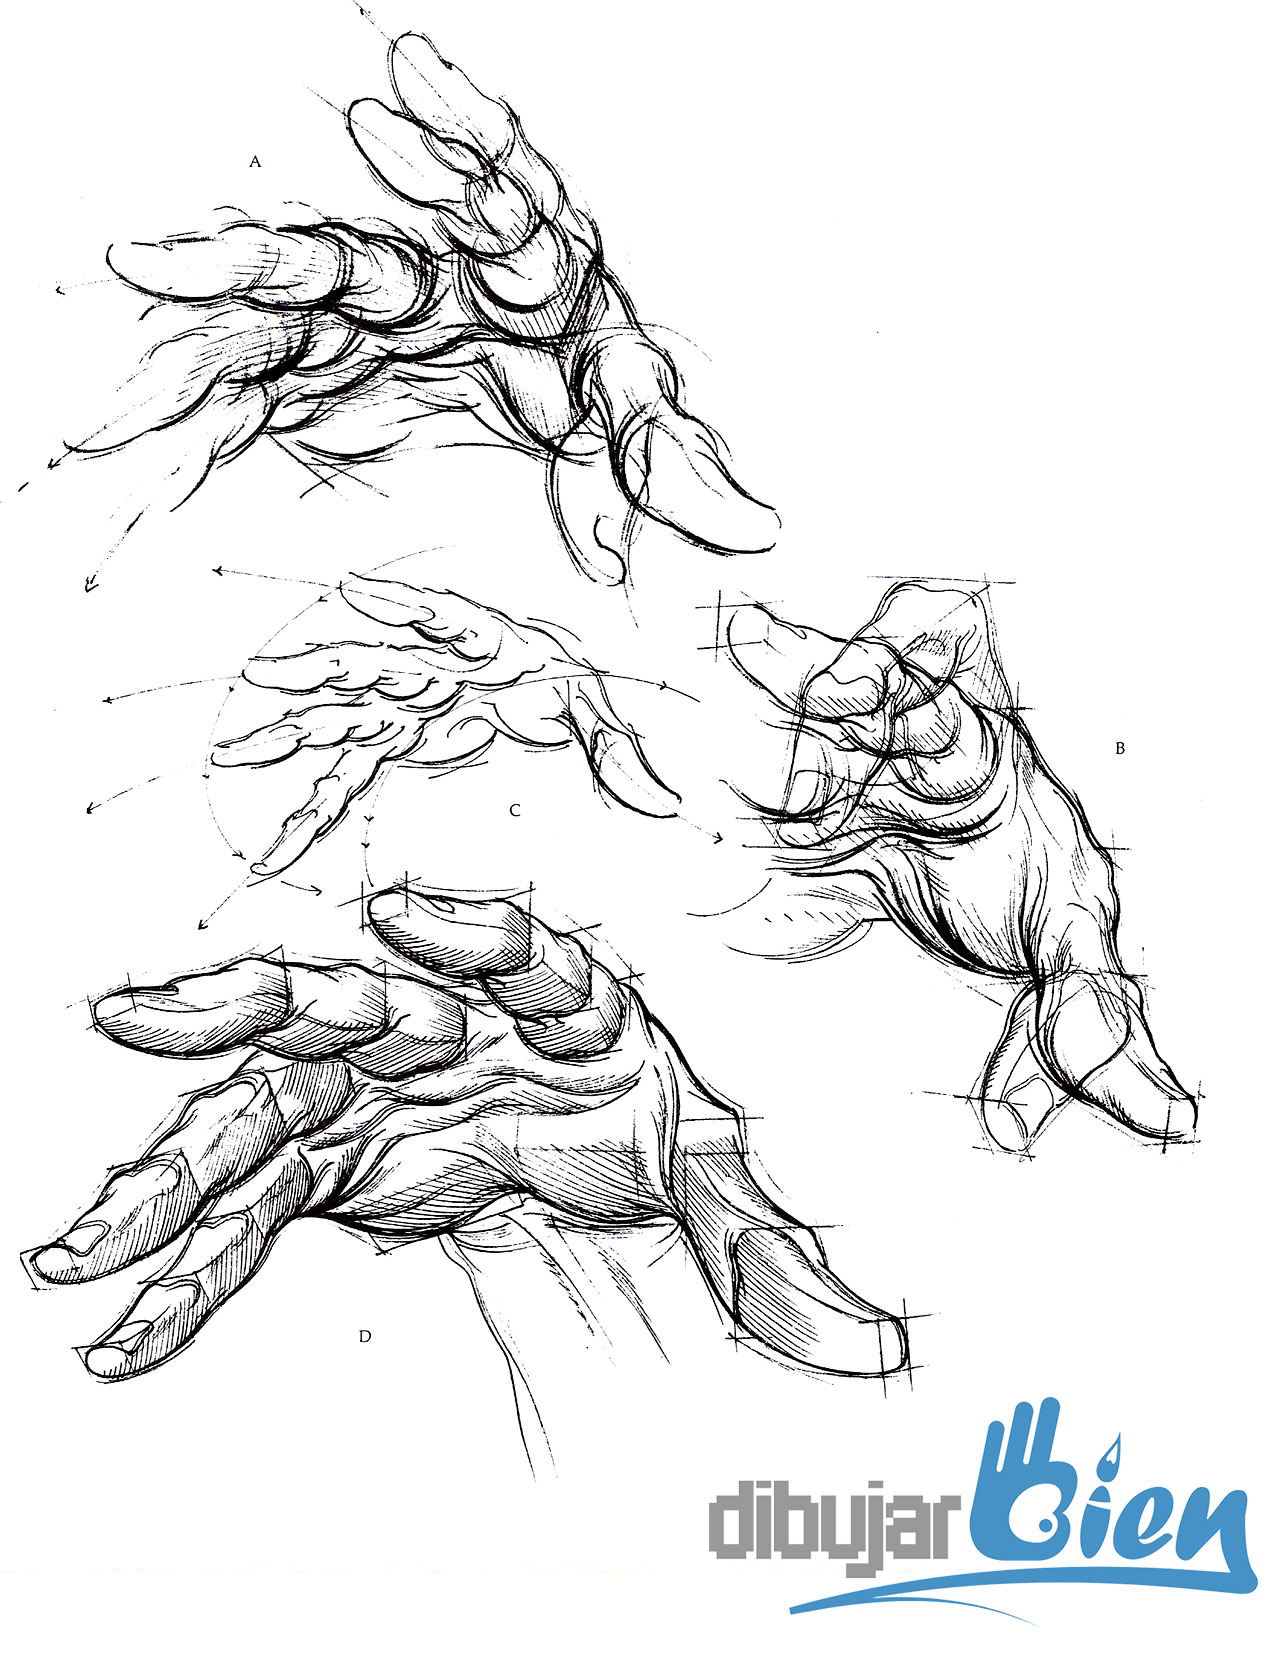 Dibujar anatomia Palabras claves relacionadas - dibujar anatomiaLong ...